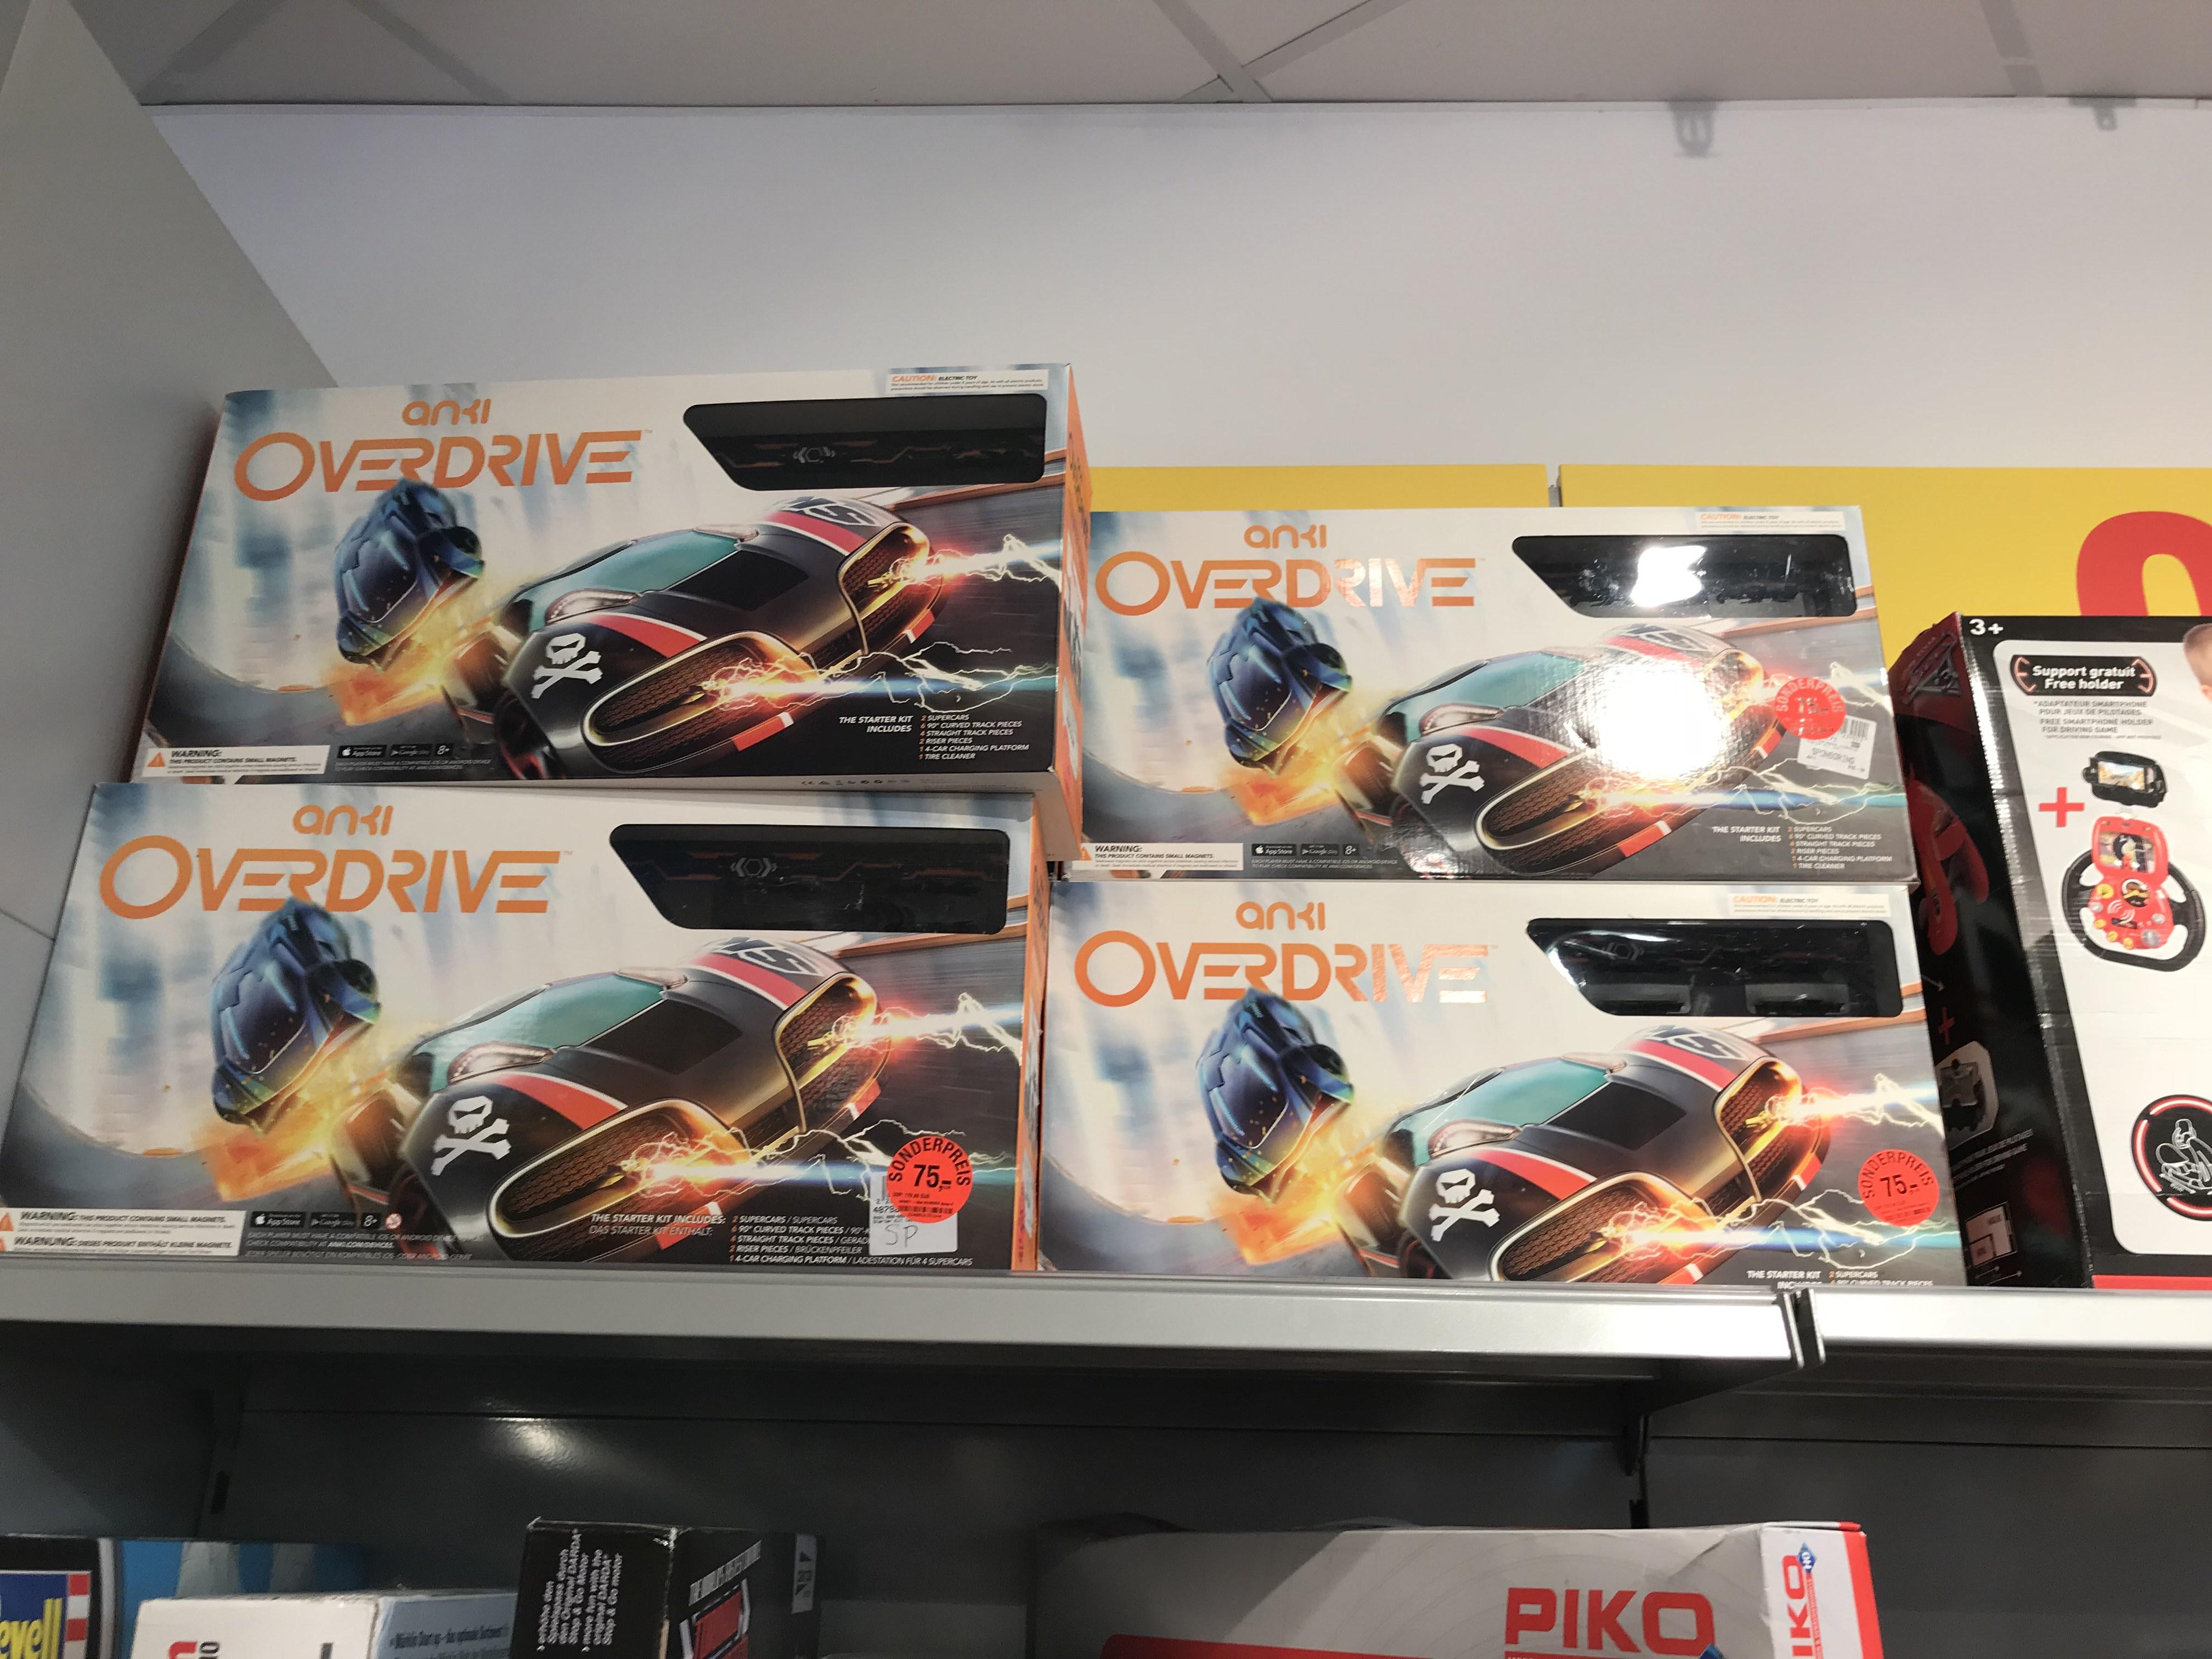 [Lokal Lübeck] Anki Overdrive Starter Kit für 75€